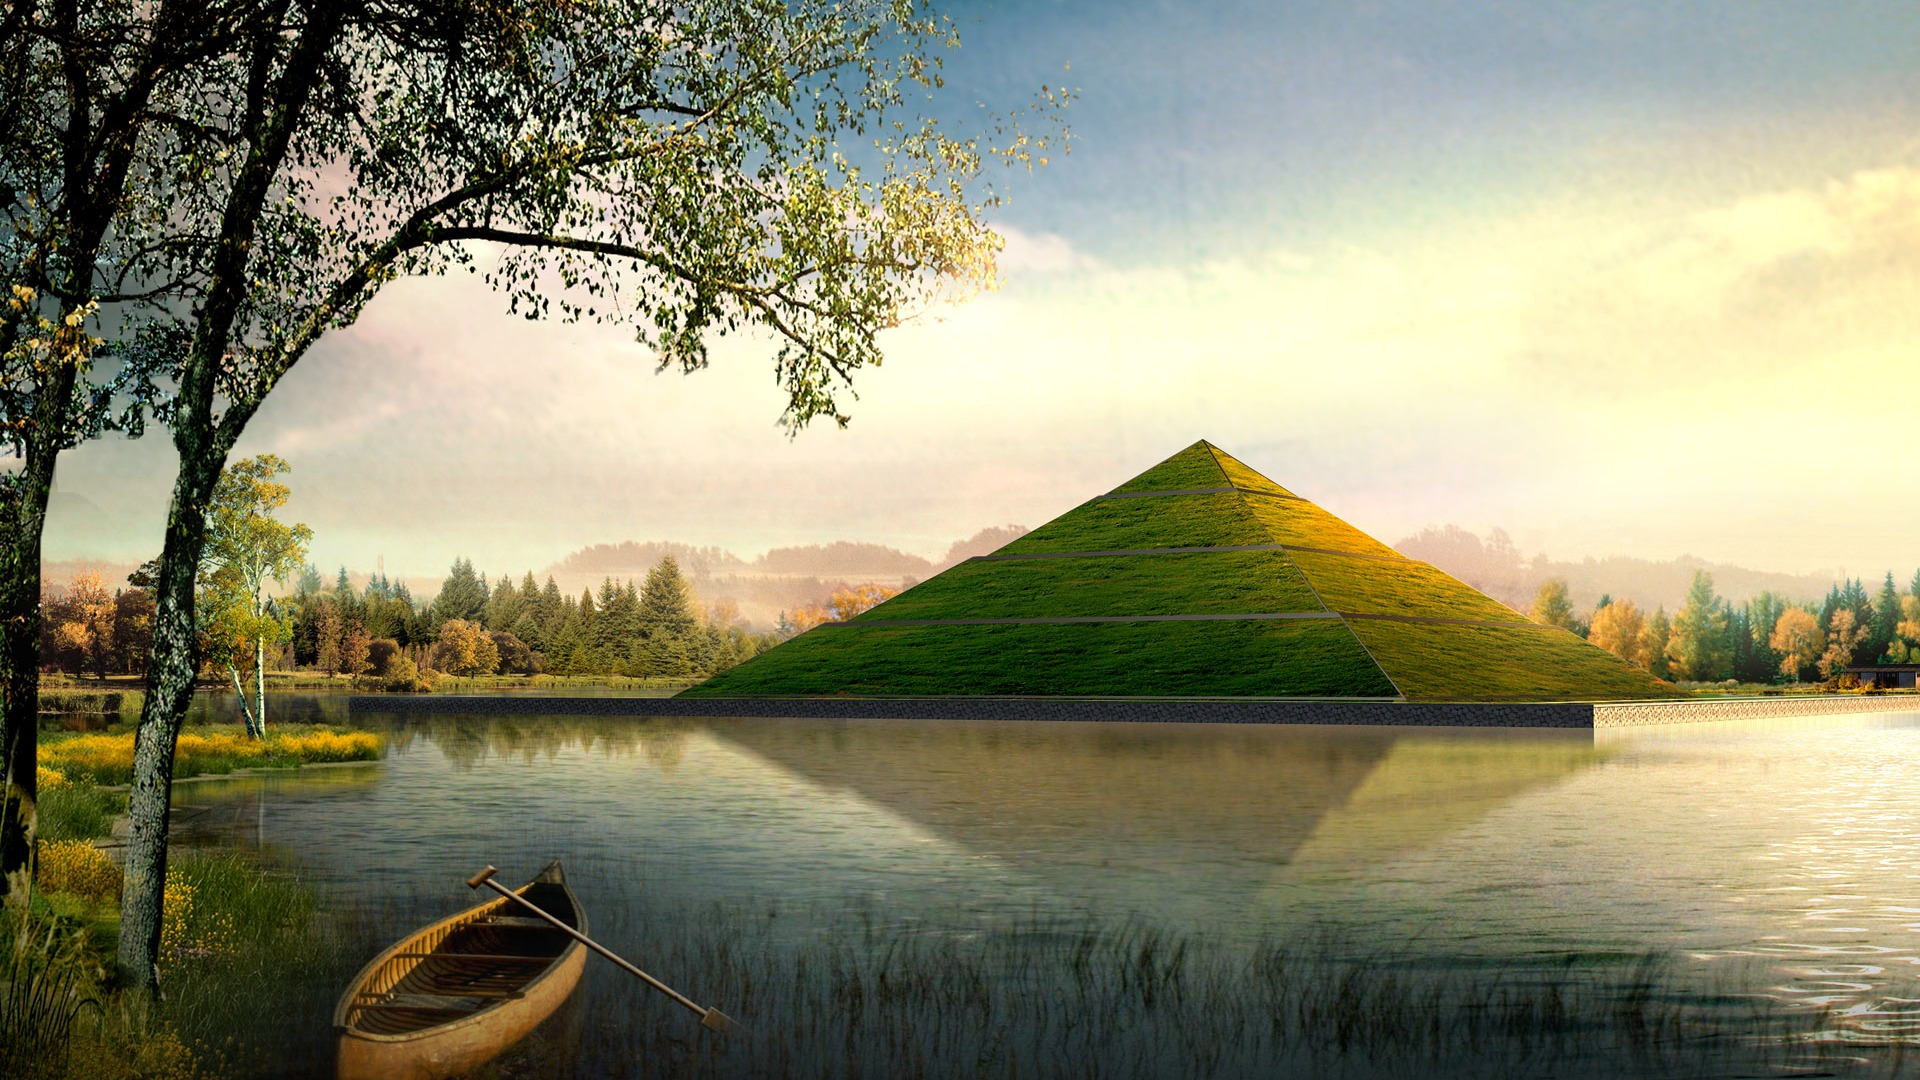 Pyramid Grass 2014872 Hd Wallpaper Backgrounds Download